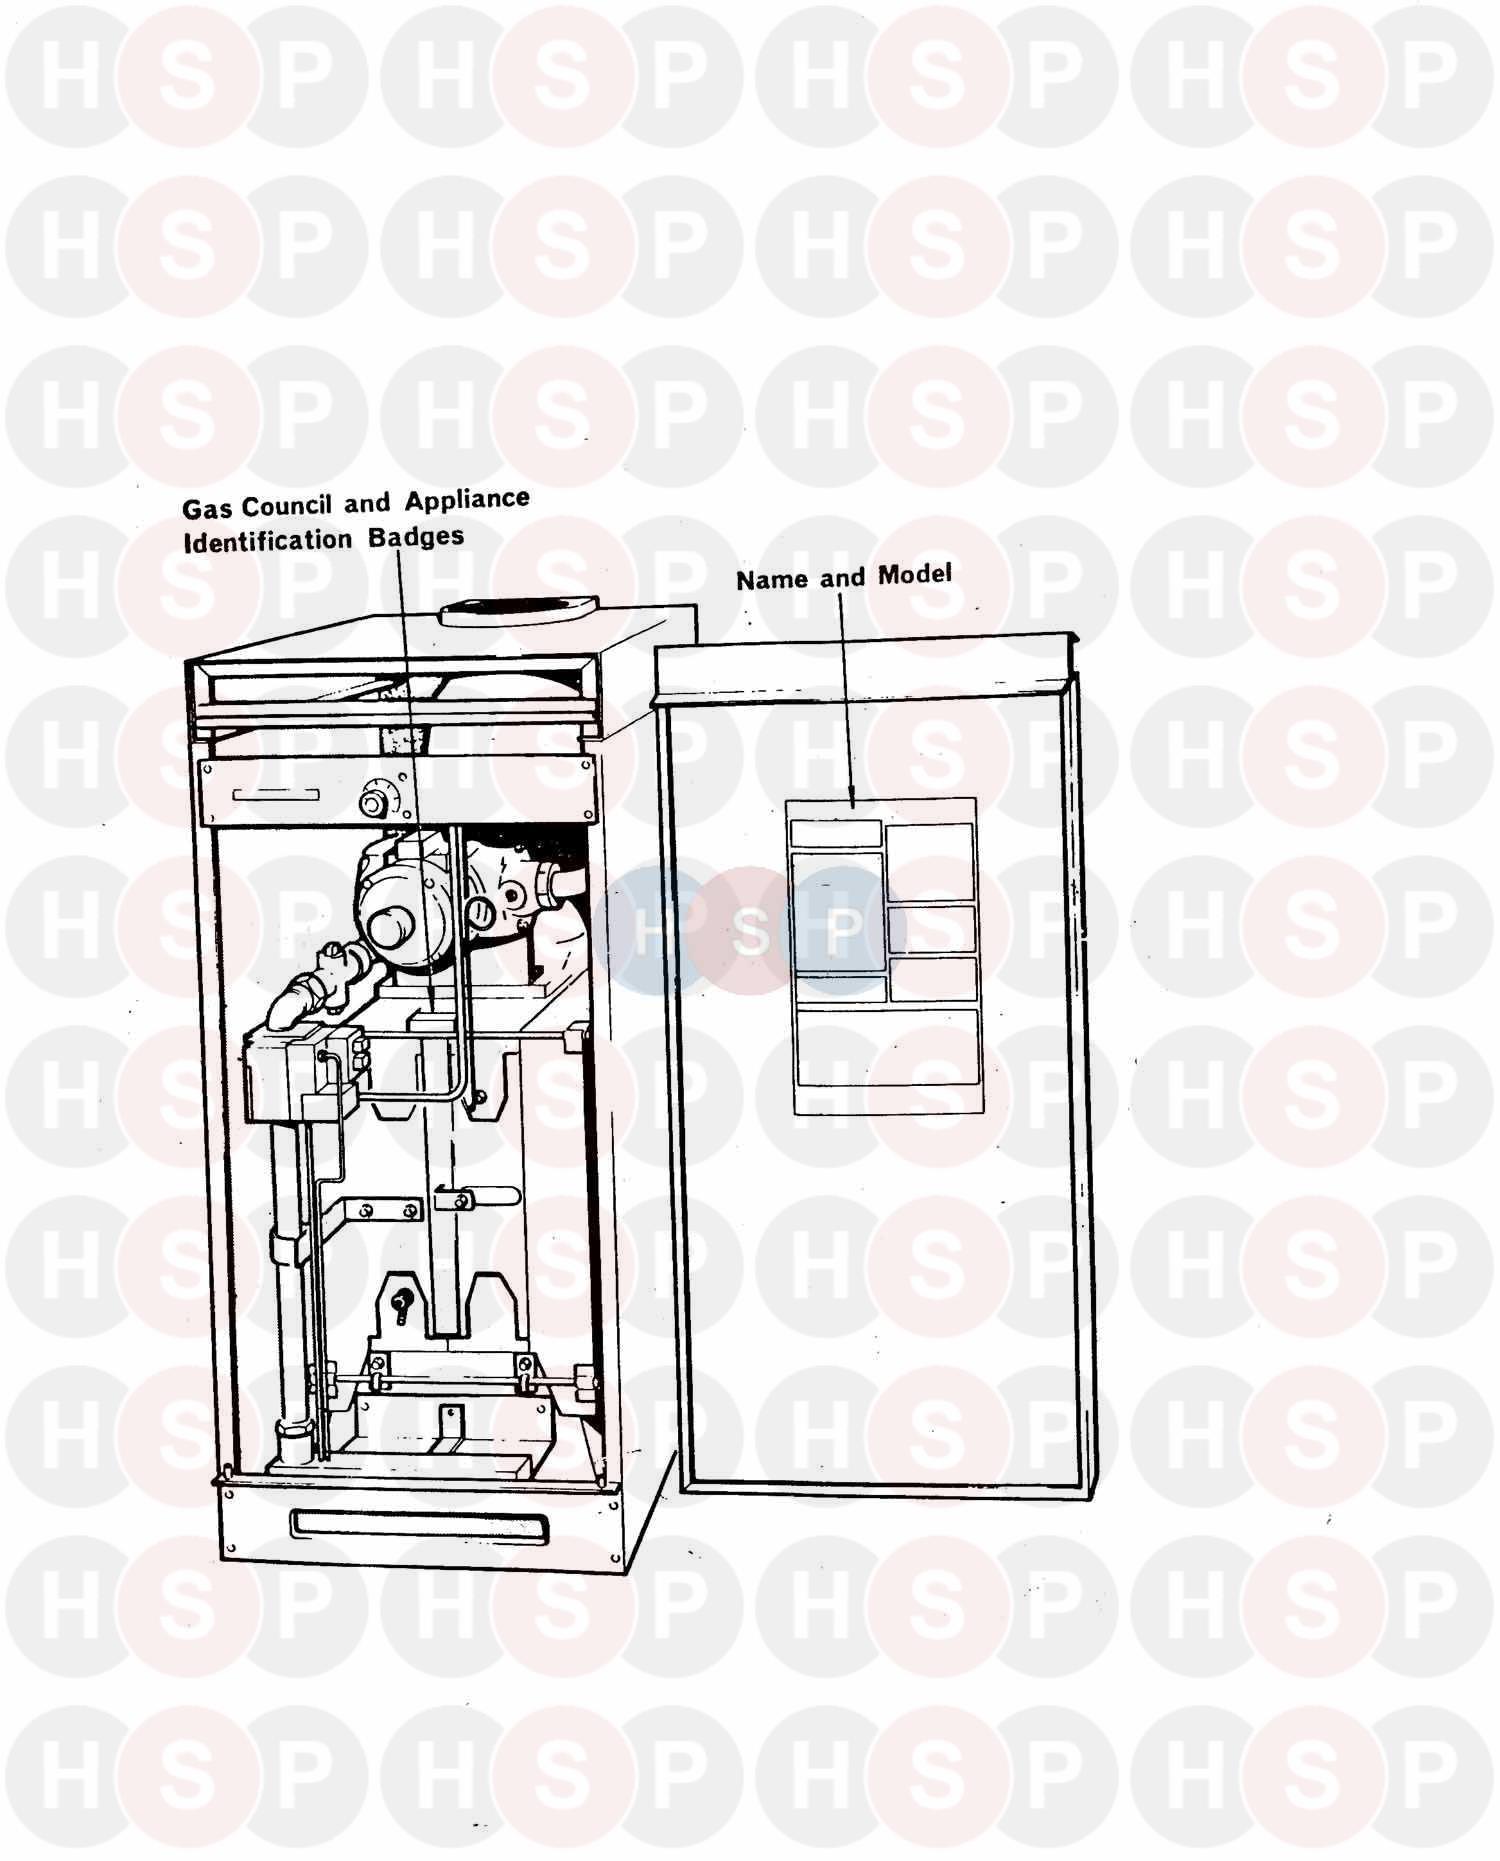 Potterton C80/23 BE SB CAT 1N(FURIGAS BNR) (APPLIANCE